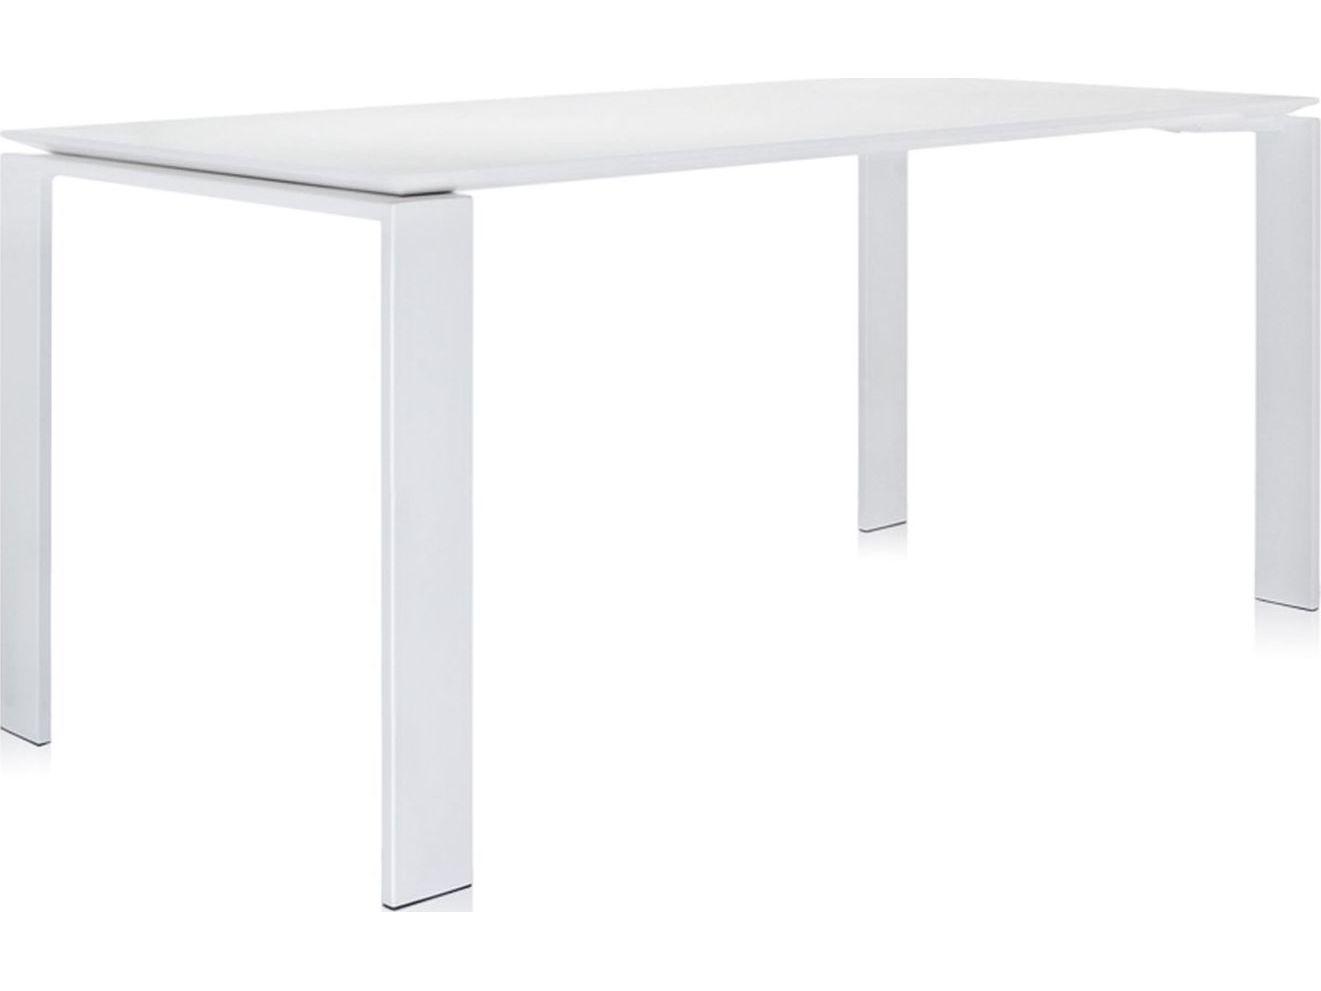 Exceptionnel ... Dining Table · Kartell Four 62u0027u0027L X 31u0027u0027W Rectangular ...